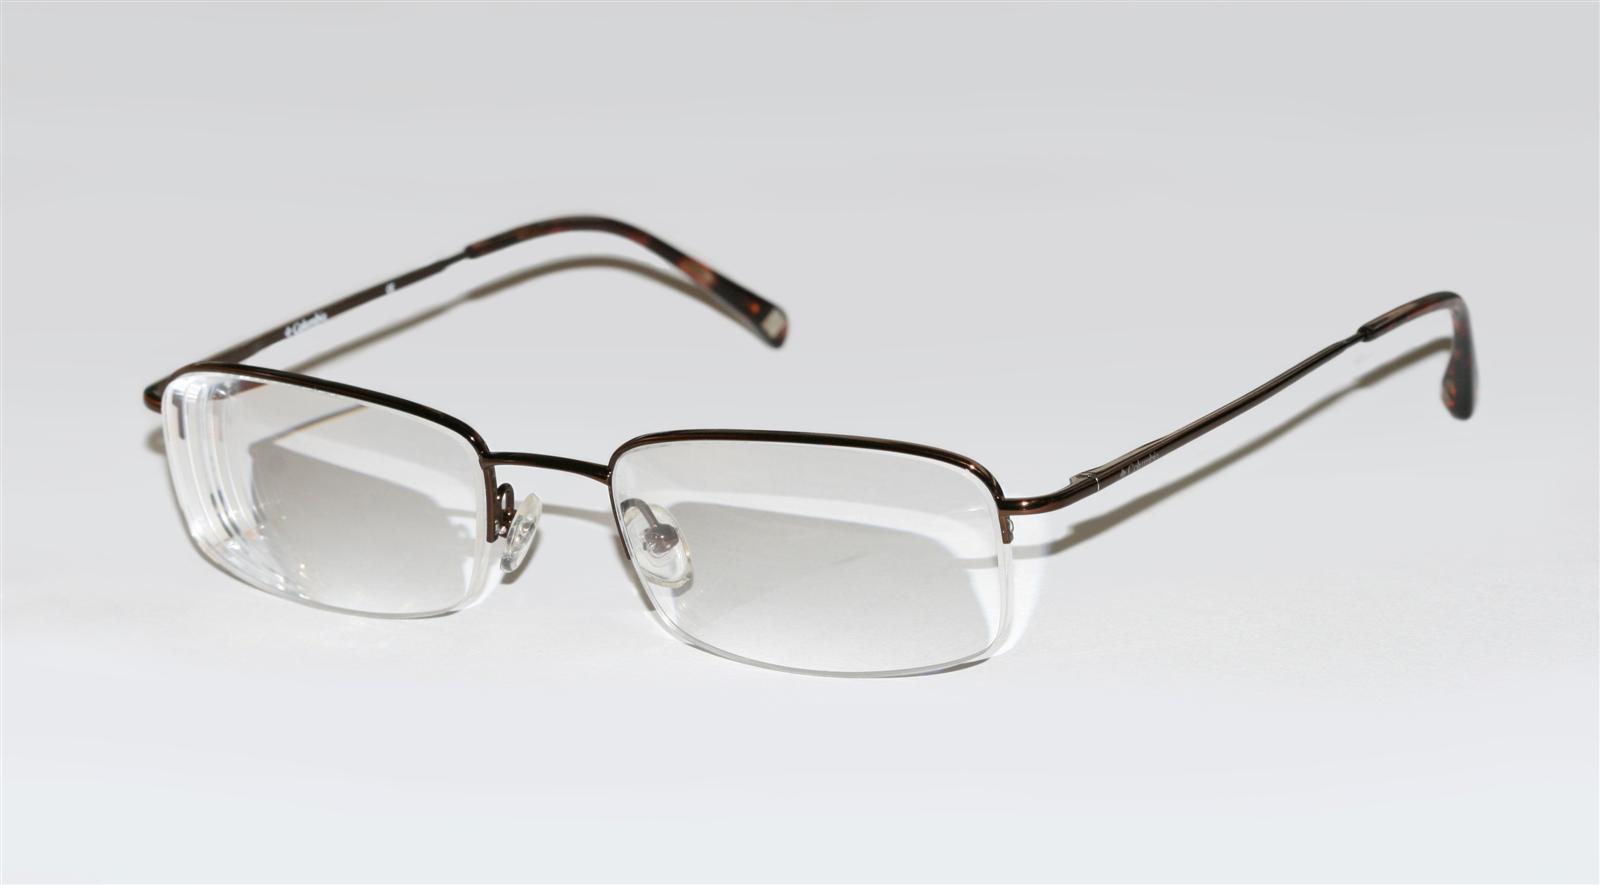 yuukiblog history of quot glasses quot